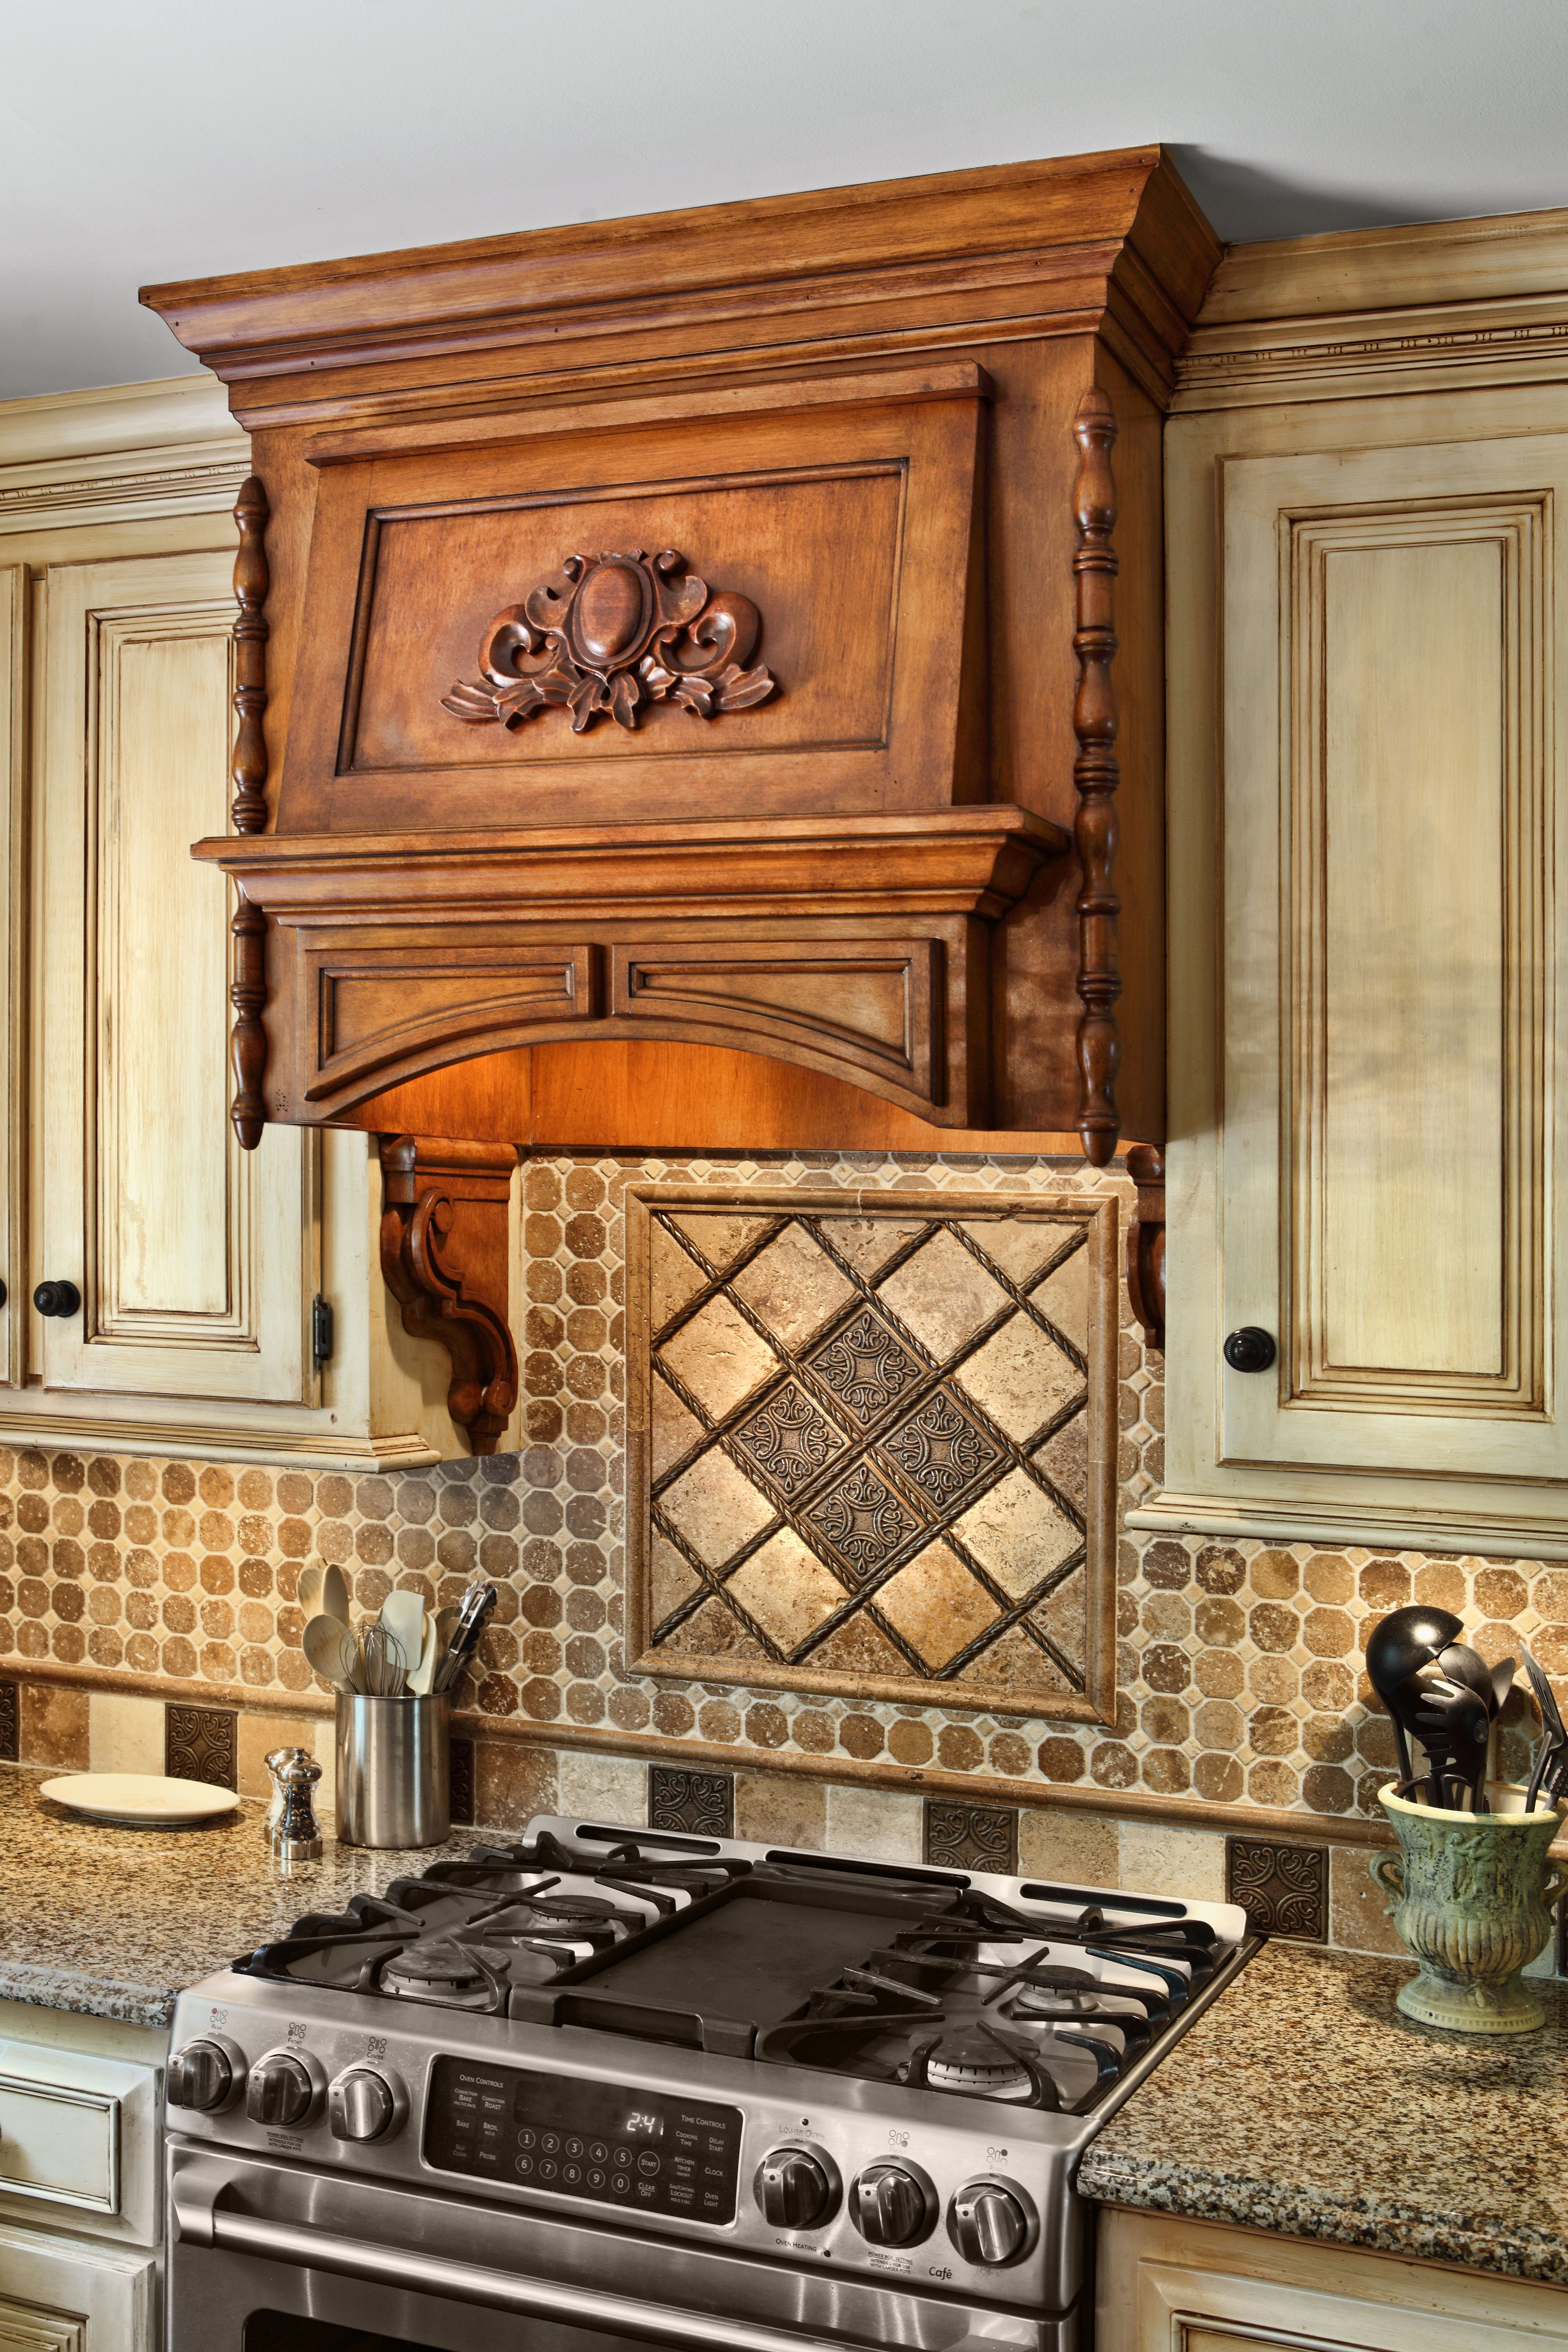 Lovely Valerie Garrett Interior Design. Macon, Georgia. Kitchen Backsplash